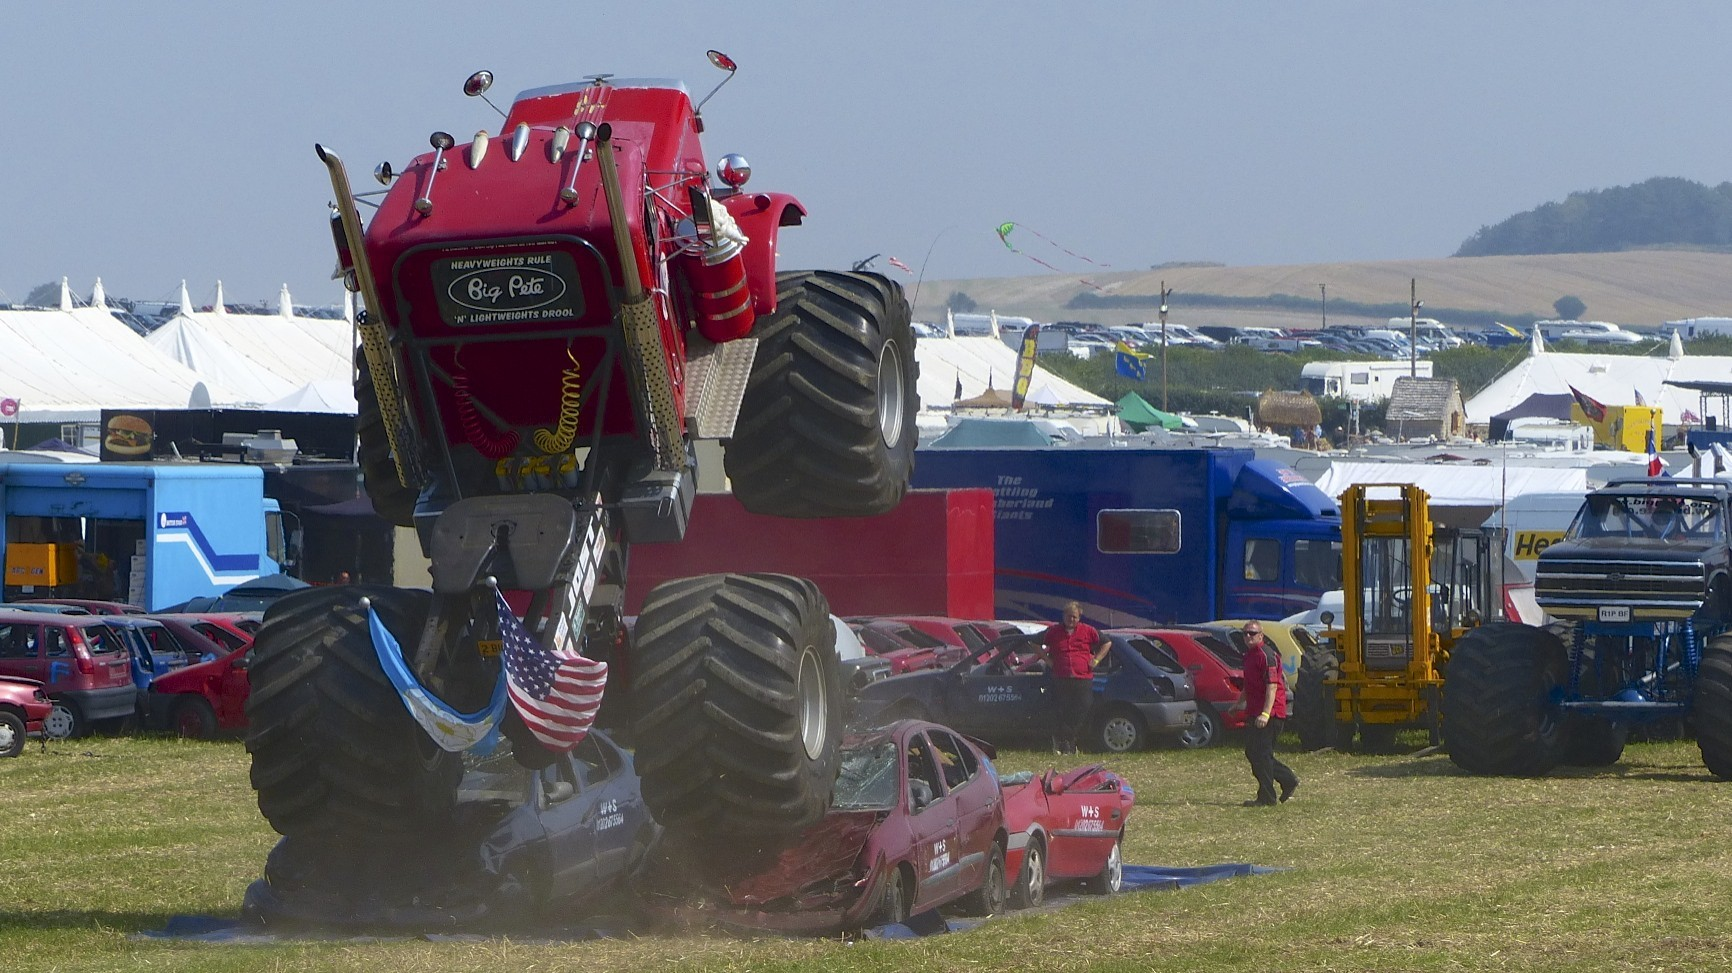 Monster truck at the Great Dorset Steam Fair.